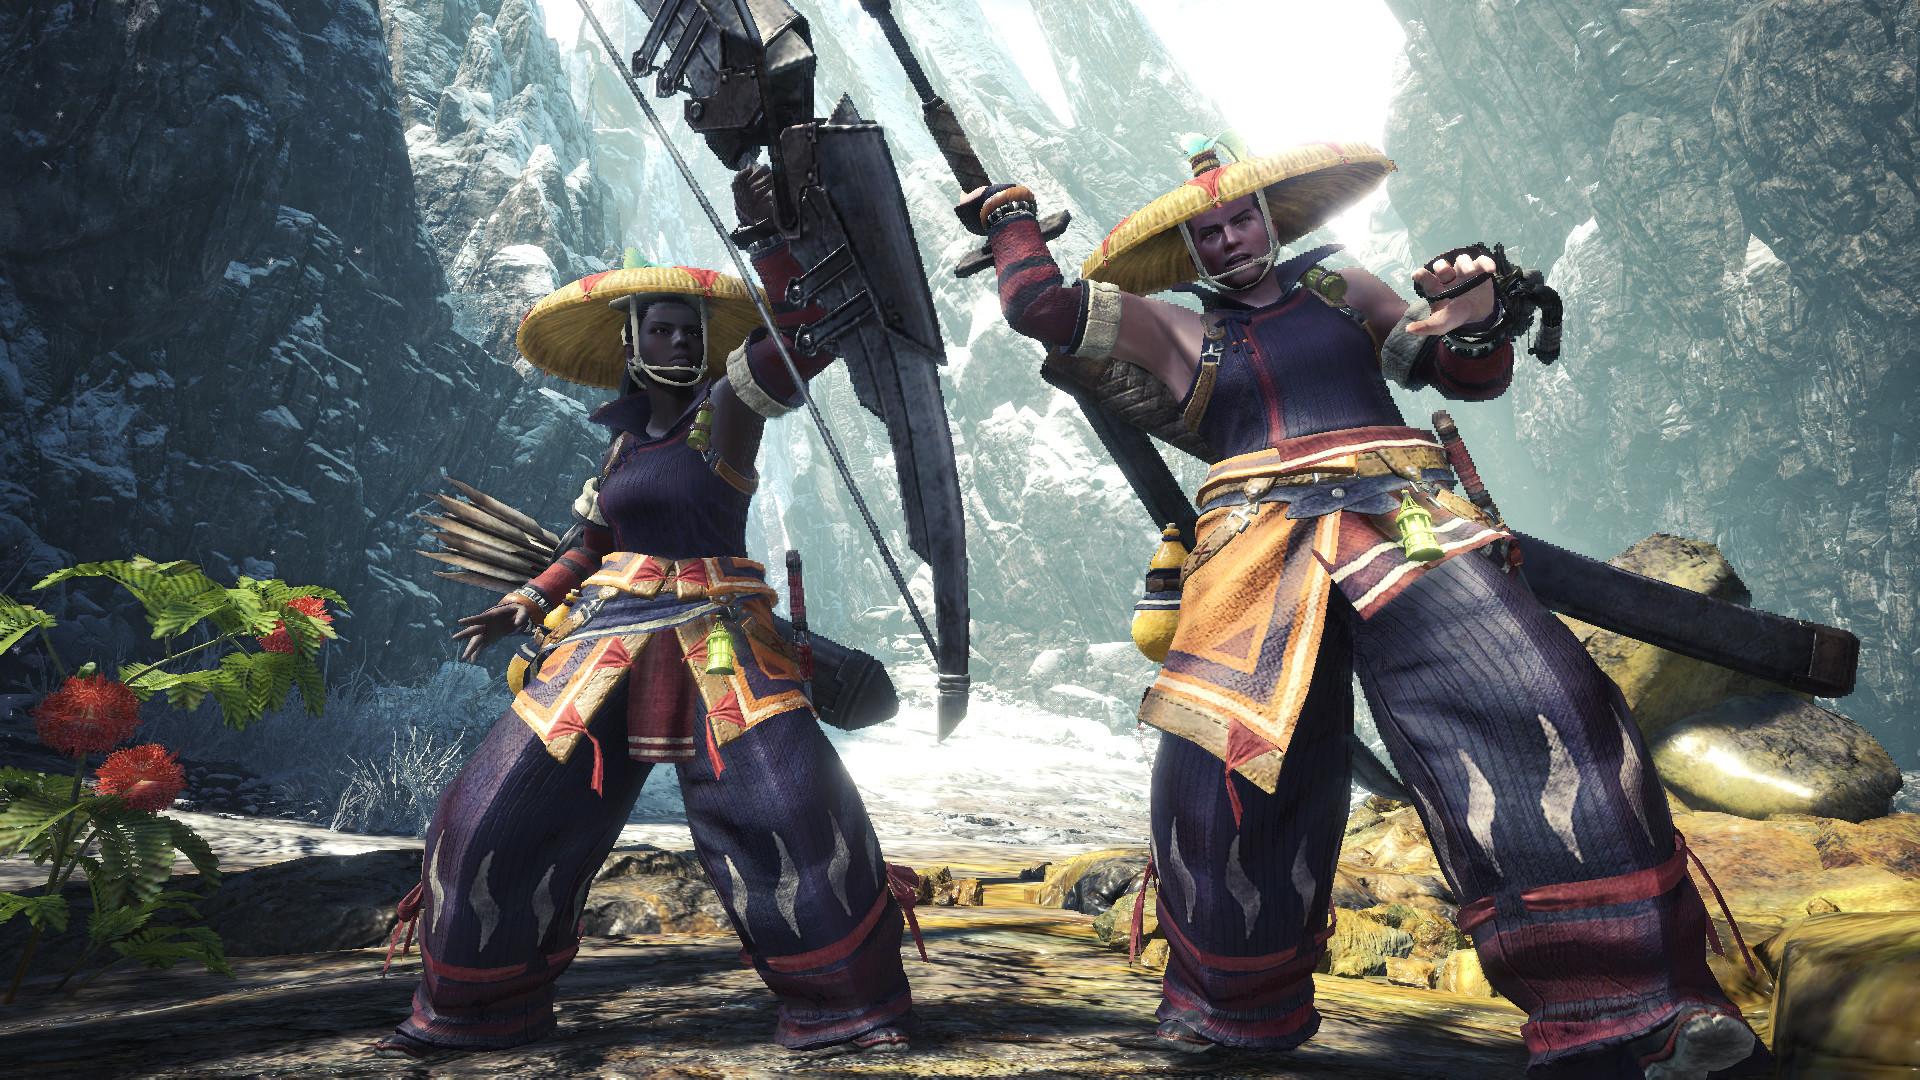 mhw yukumo layered armor